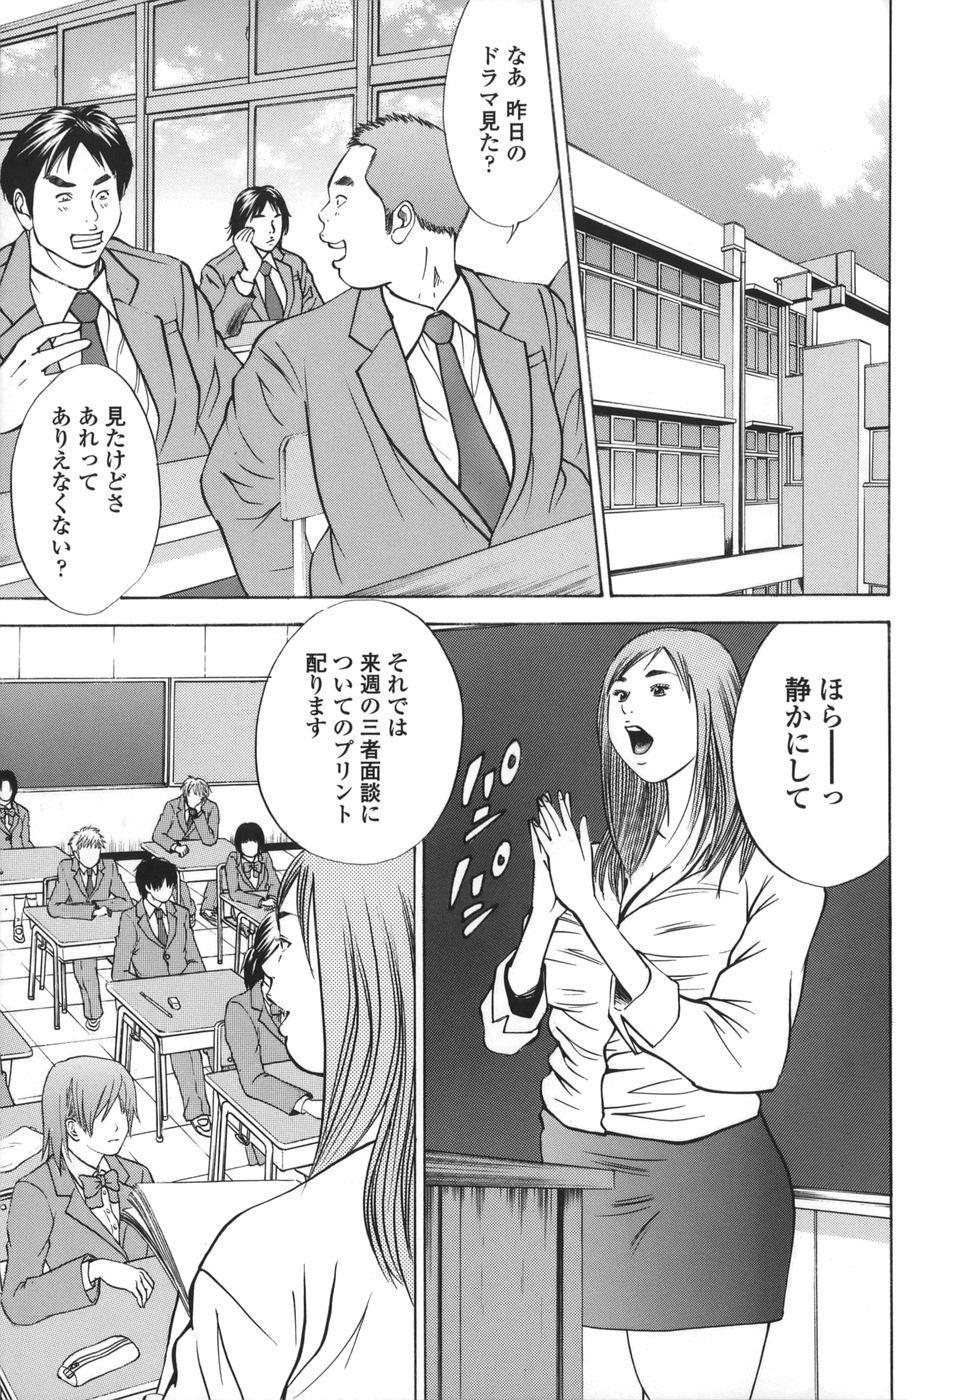 Kinshin Goukan - Near Relation Rapes 166